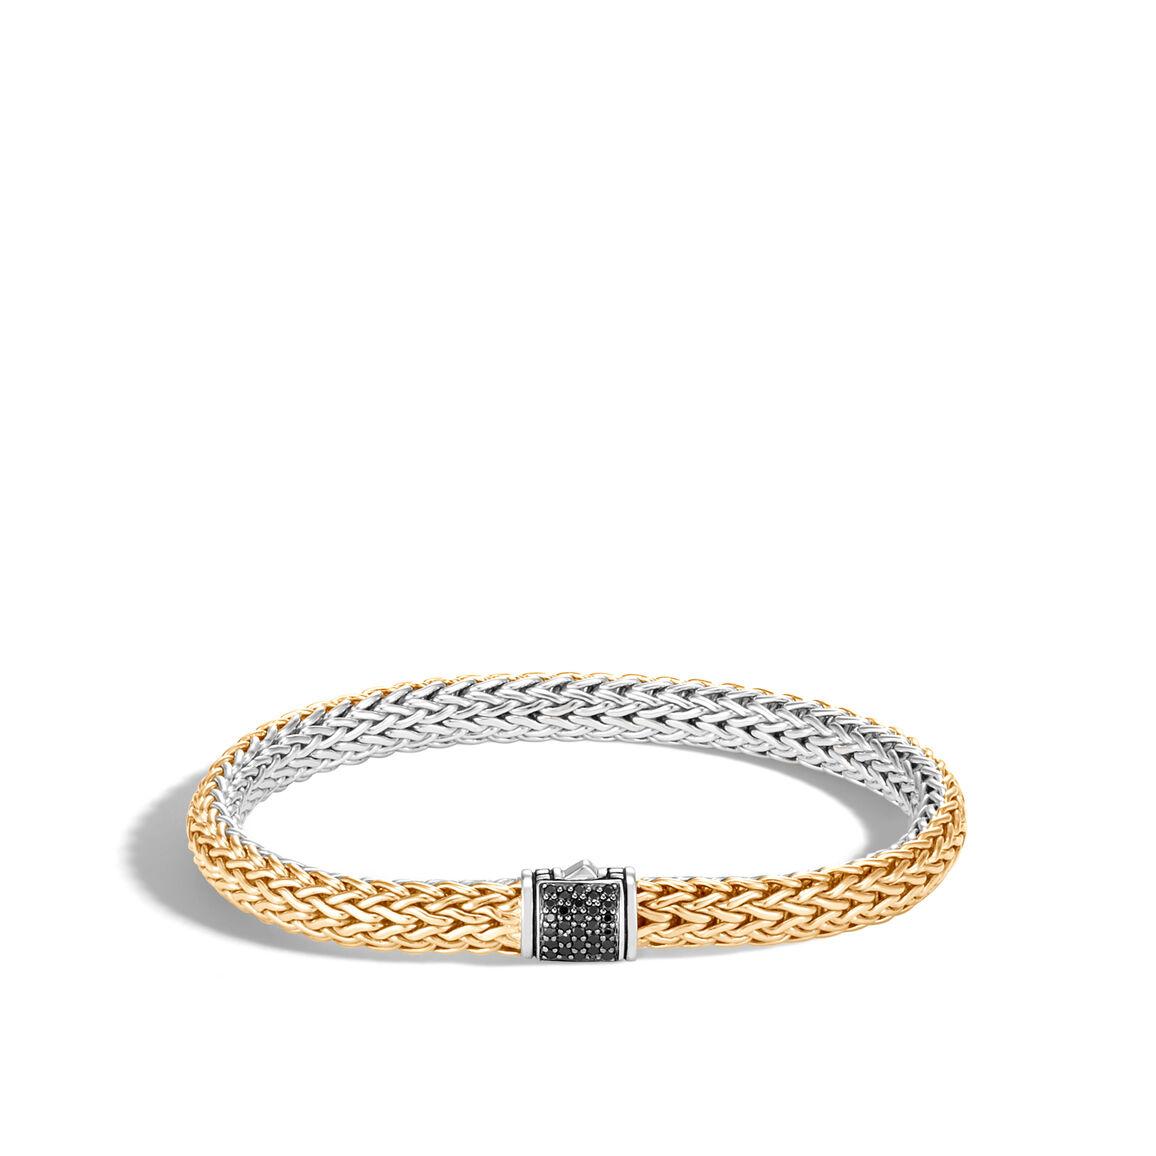 Classic Chain 6.5MM Reversible Bracelet, Silver, 18K, Gems